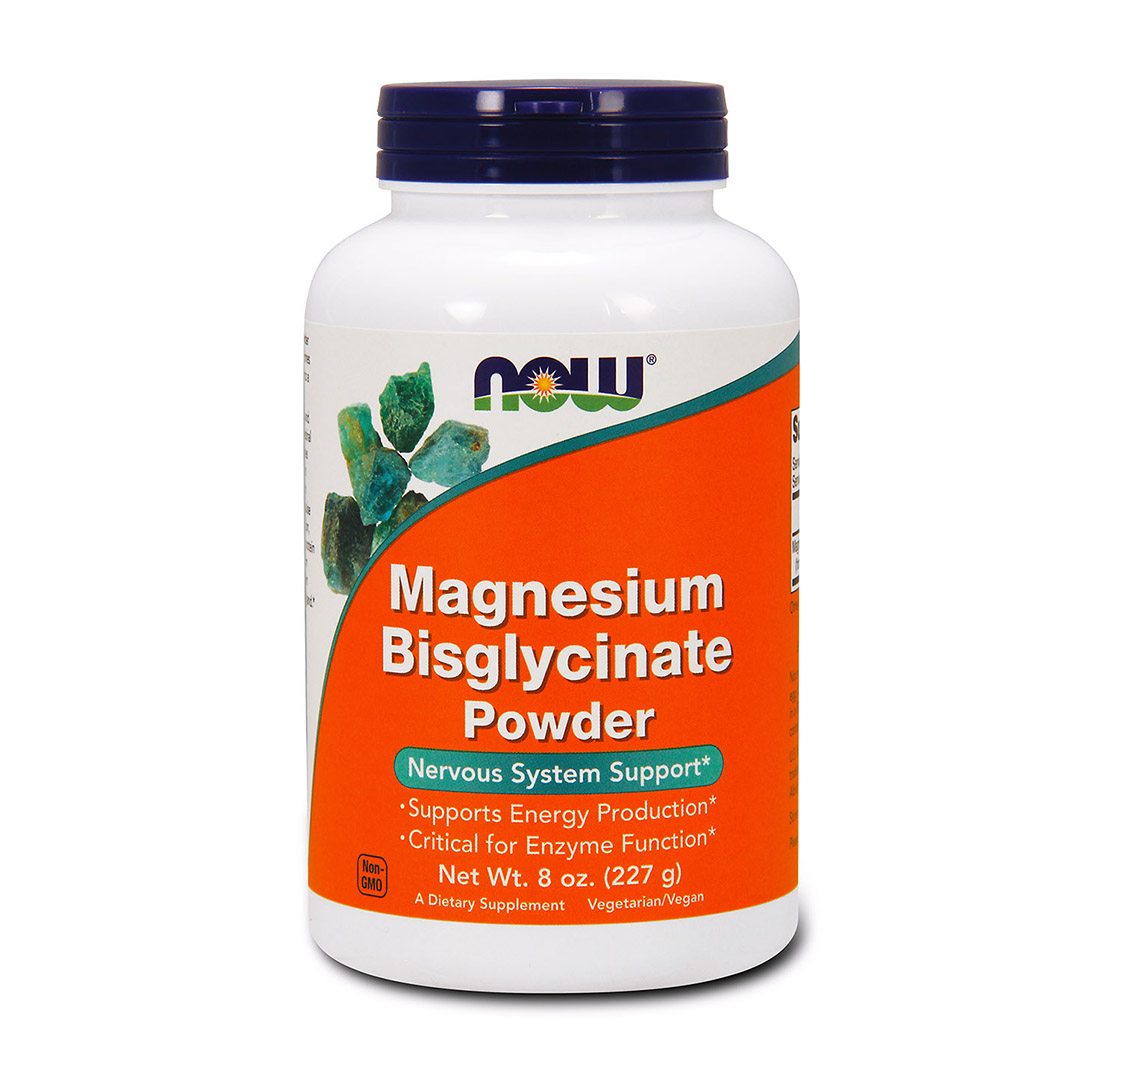 NOW Magnesium Bisglycinate Powder - hořčík prášek